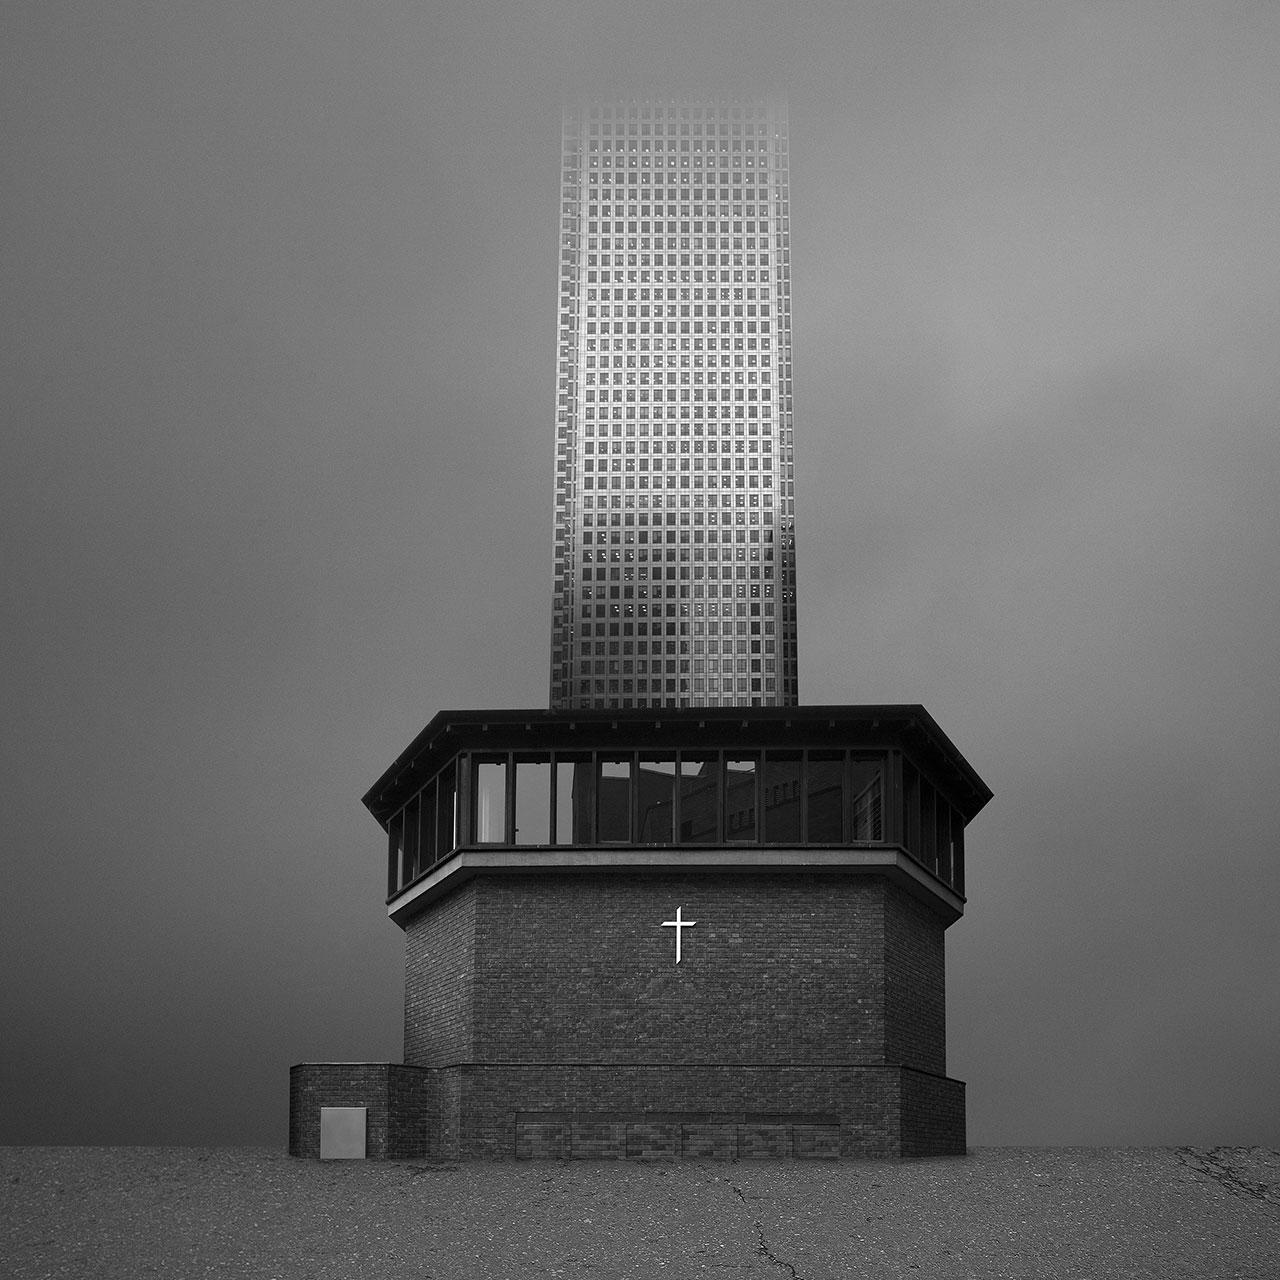 Beomsik Won,Archisculpture 005, 2011. Archival pigment print, 50x50cm.